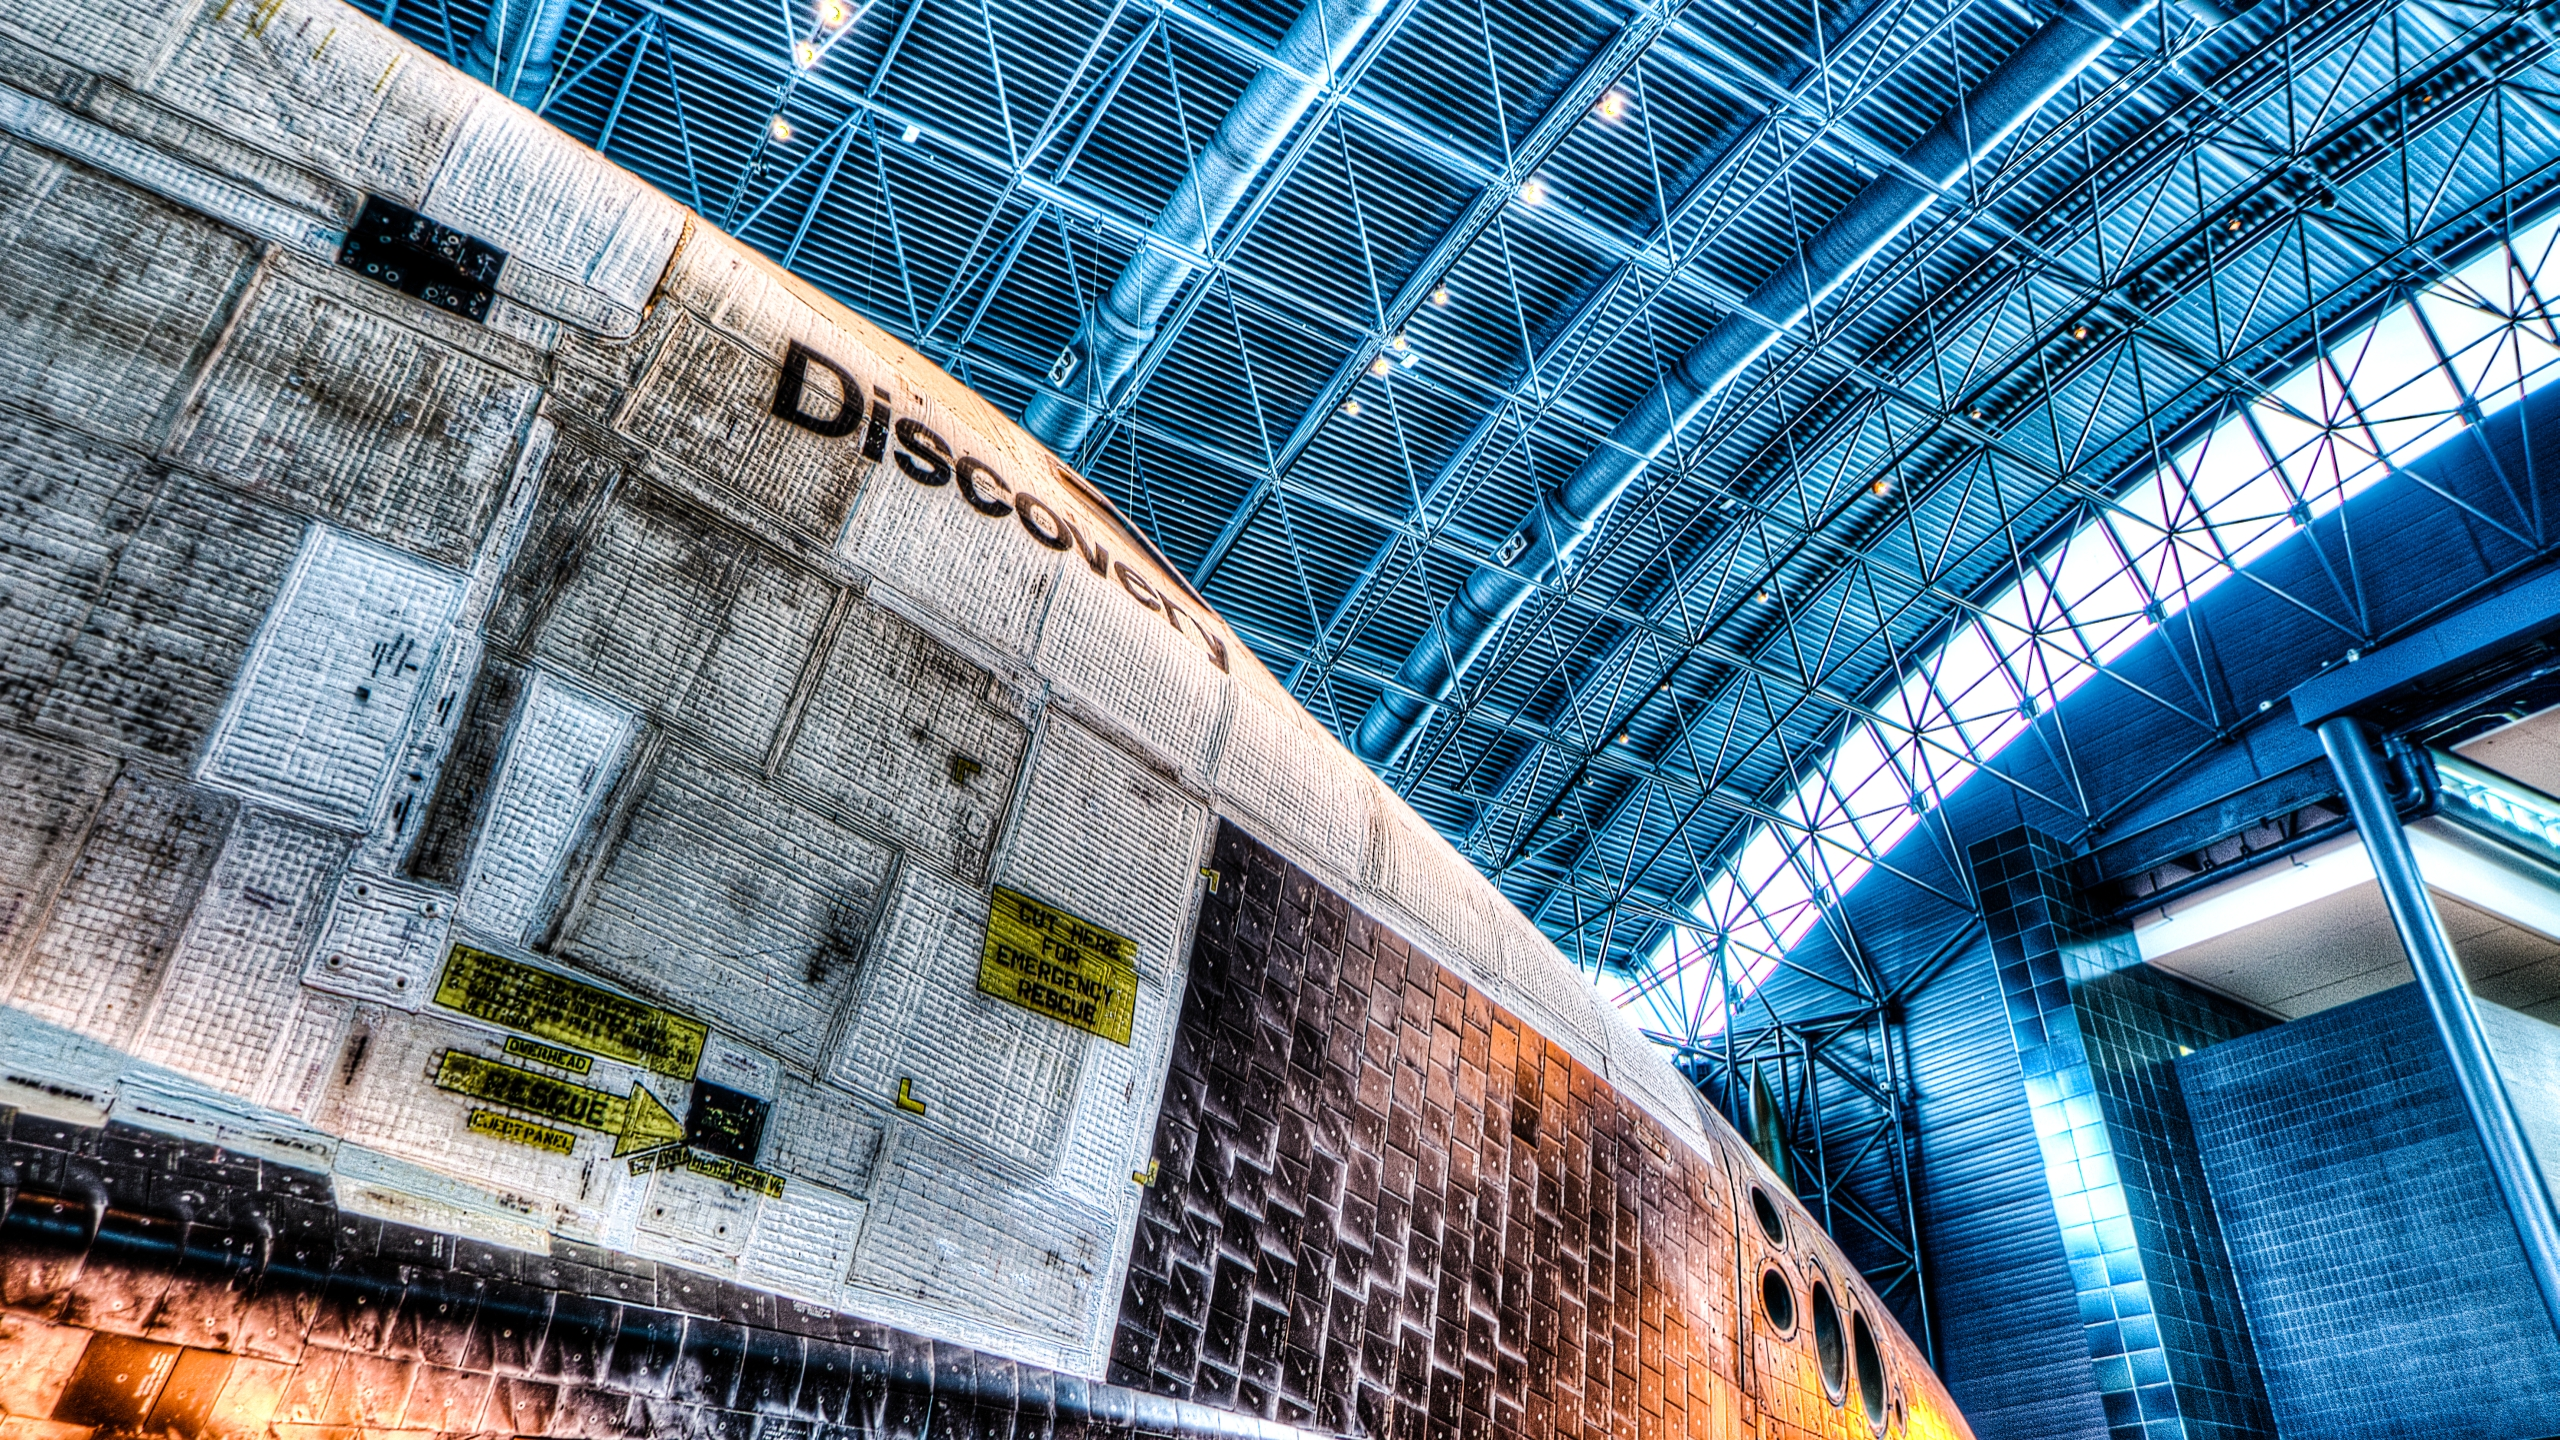 Space Shuttle Computer Wallpapers, Desktop Backgrounds | 2560x1440 ...